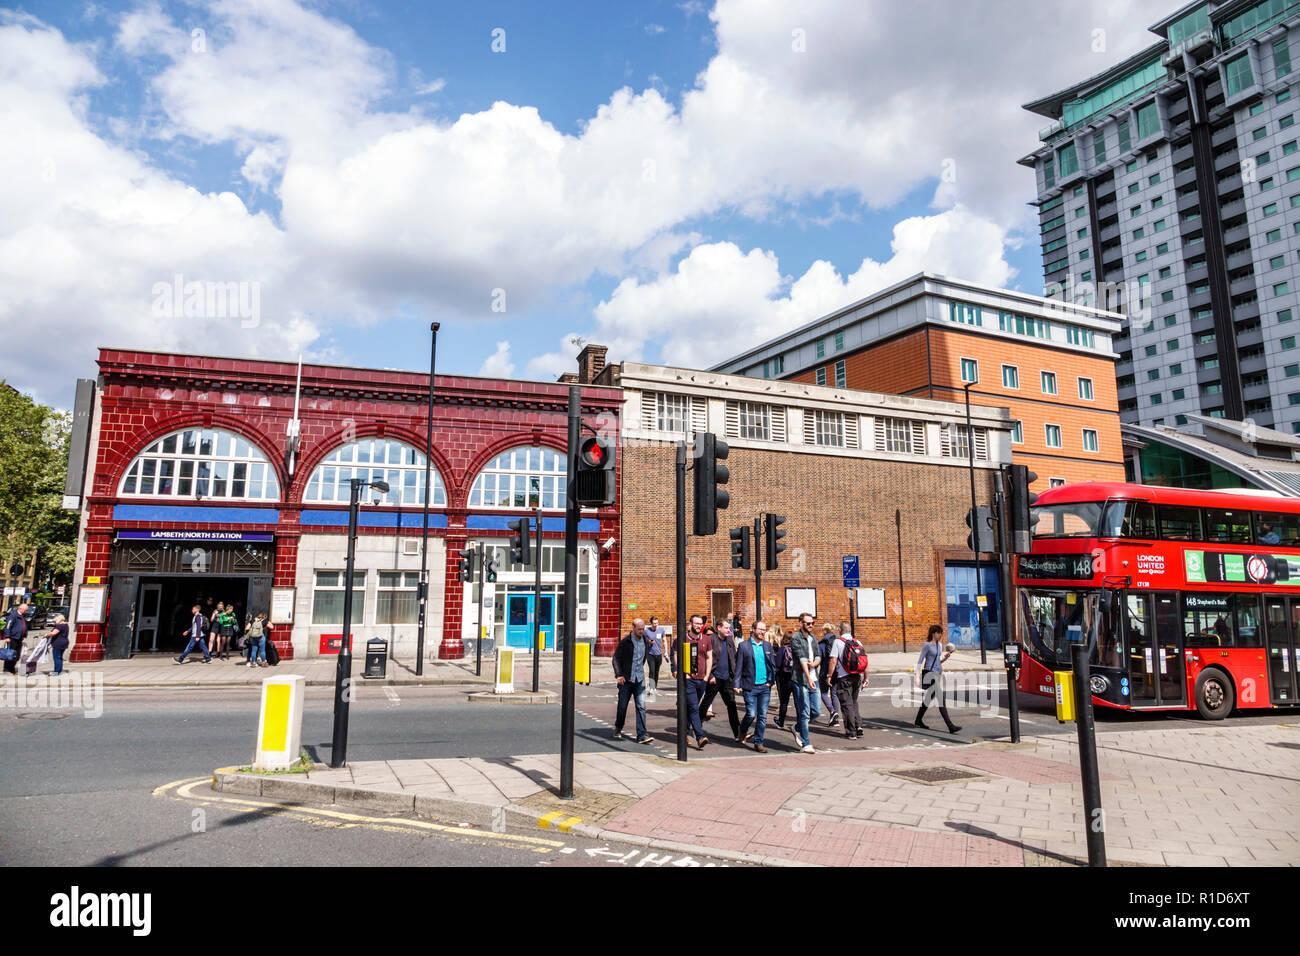 London England United Kingdom Great Britain Lambeth South Bank Lambeth North Underground Station subway tube public transportation exterior intersecti - Stock Image